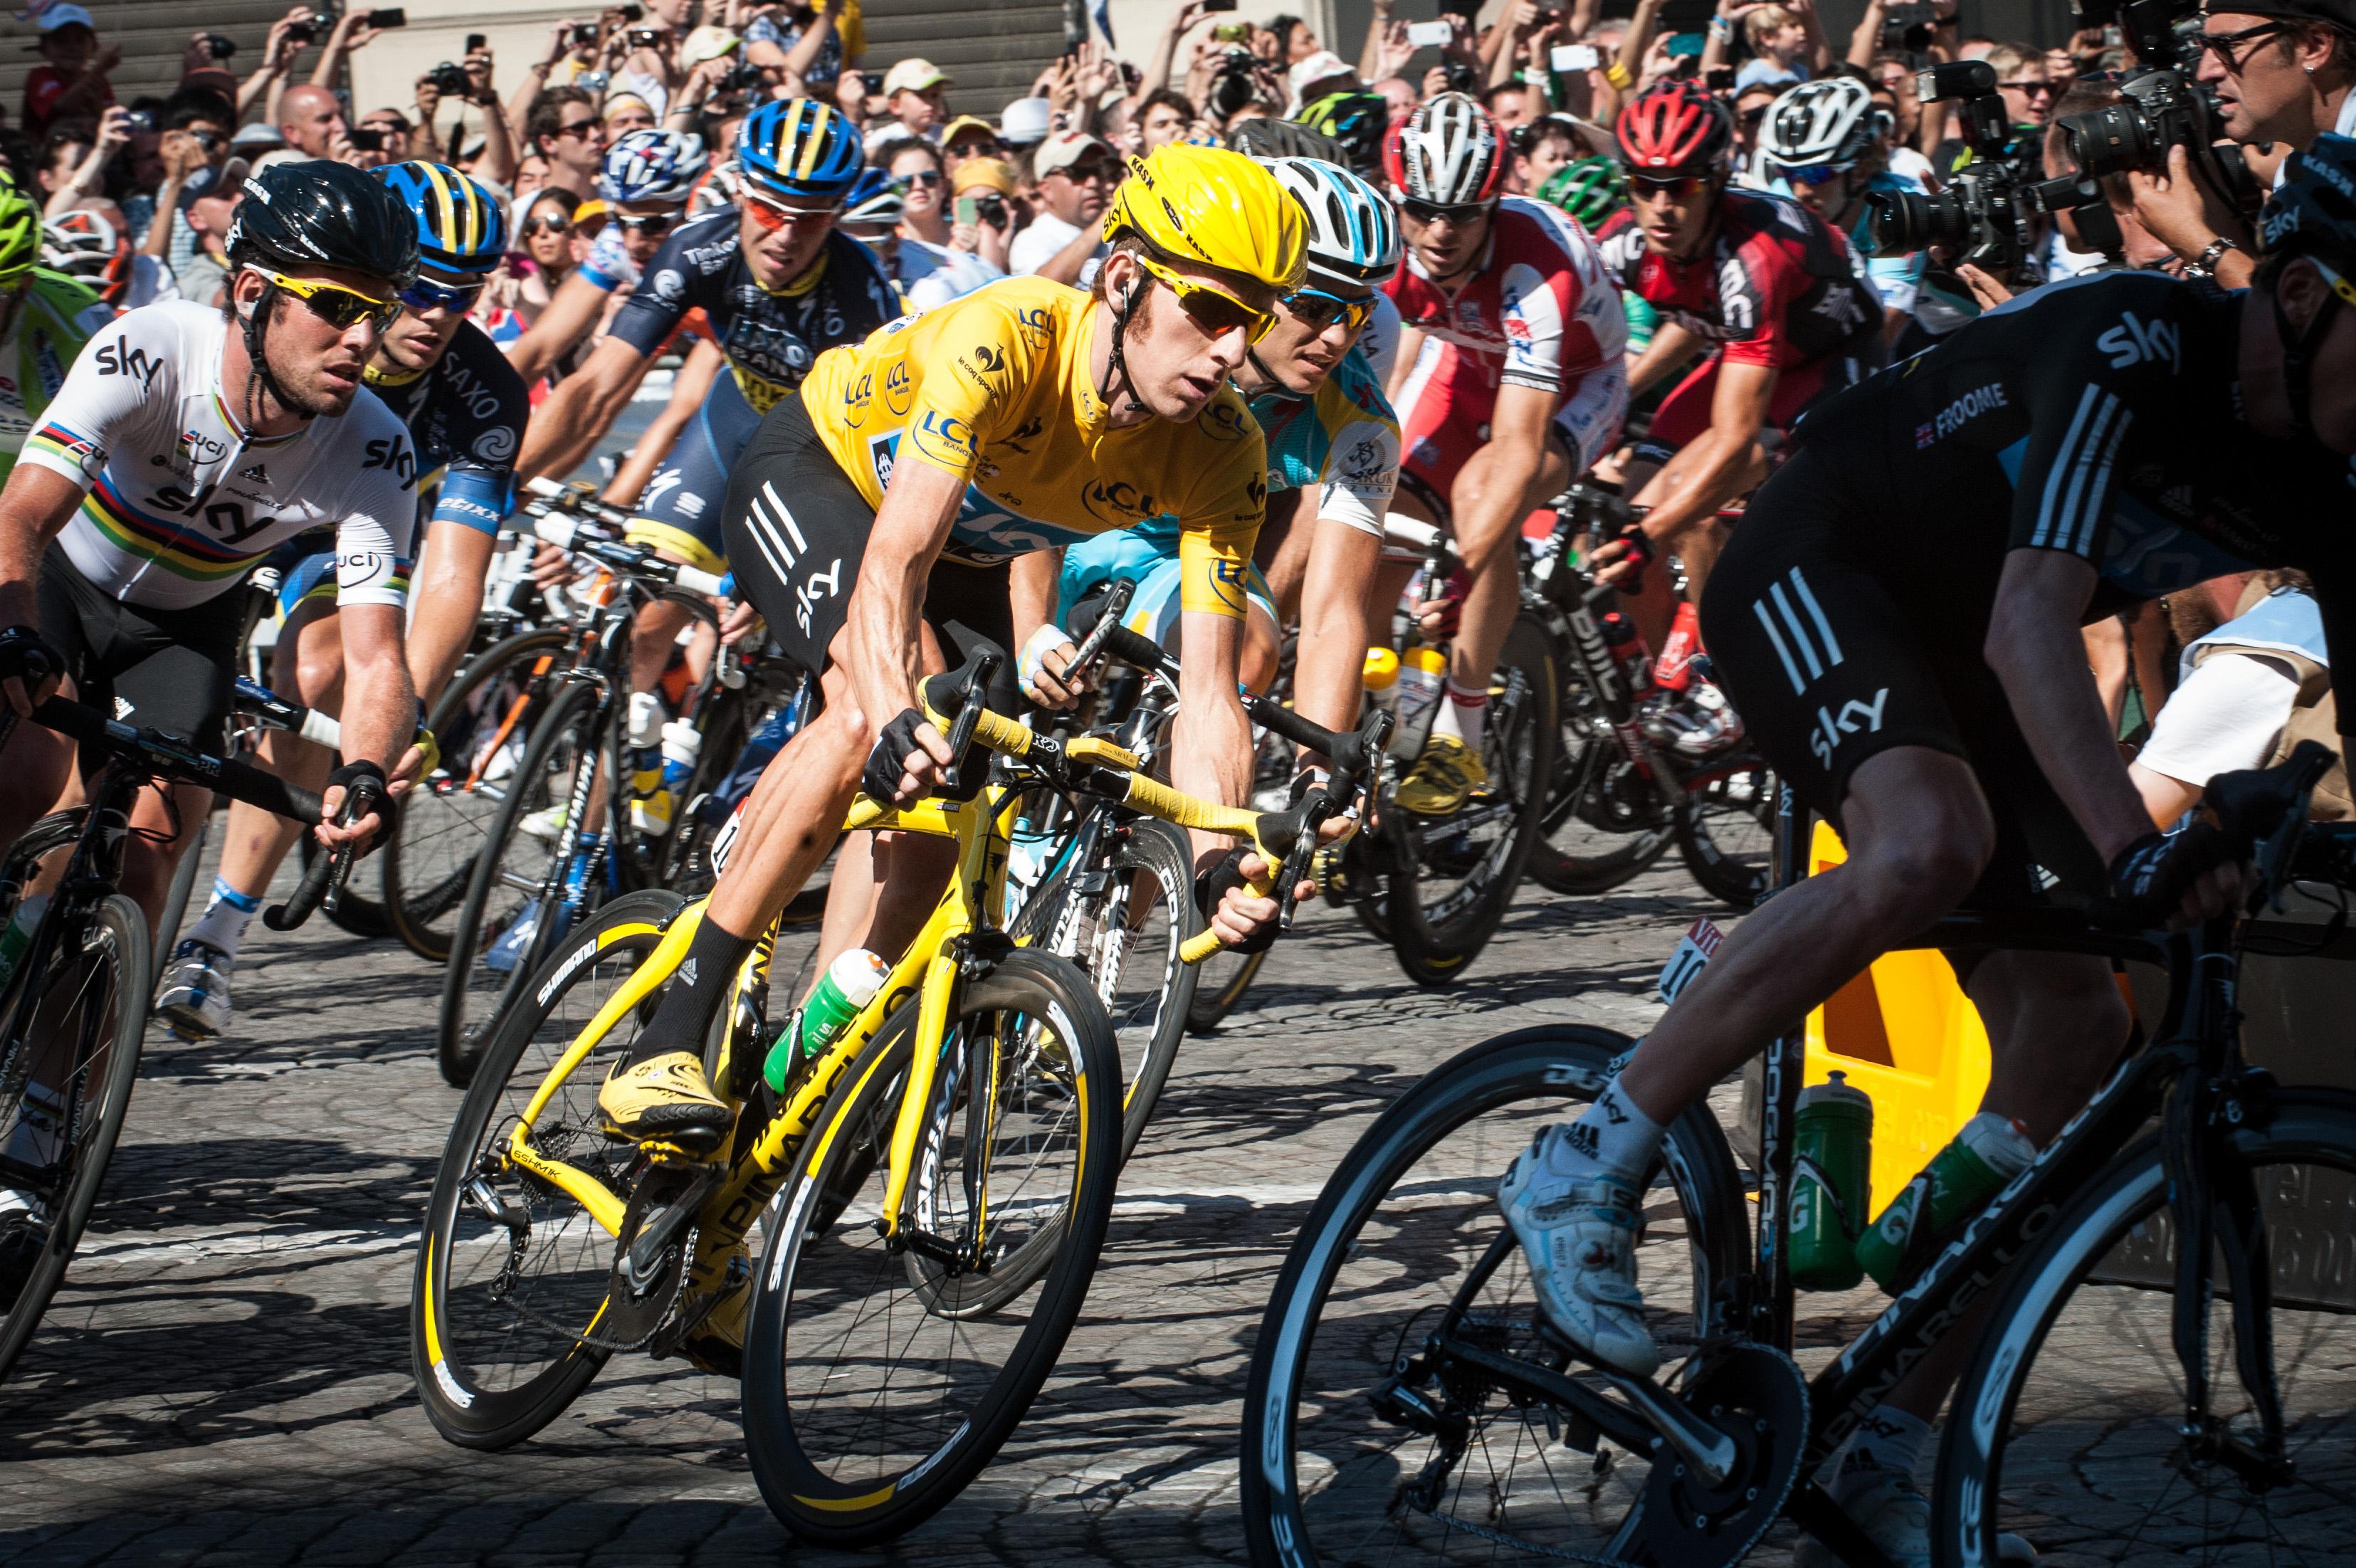 Tour De France HD Wallpapers 881 Wallpaper Viewallpapercom 3310x2203